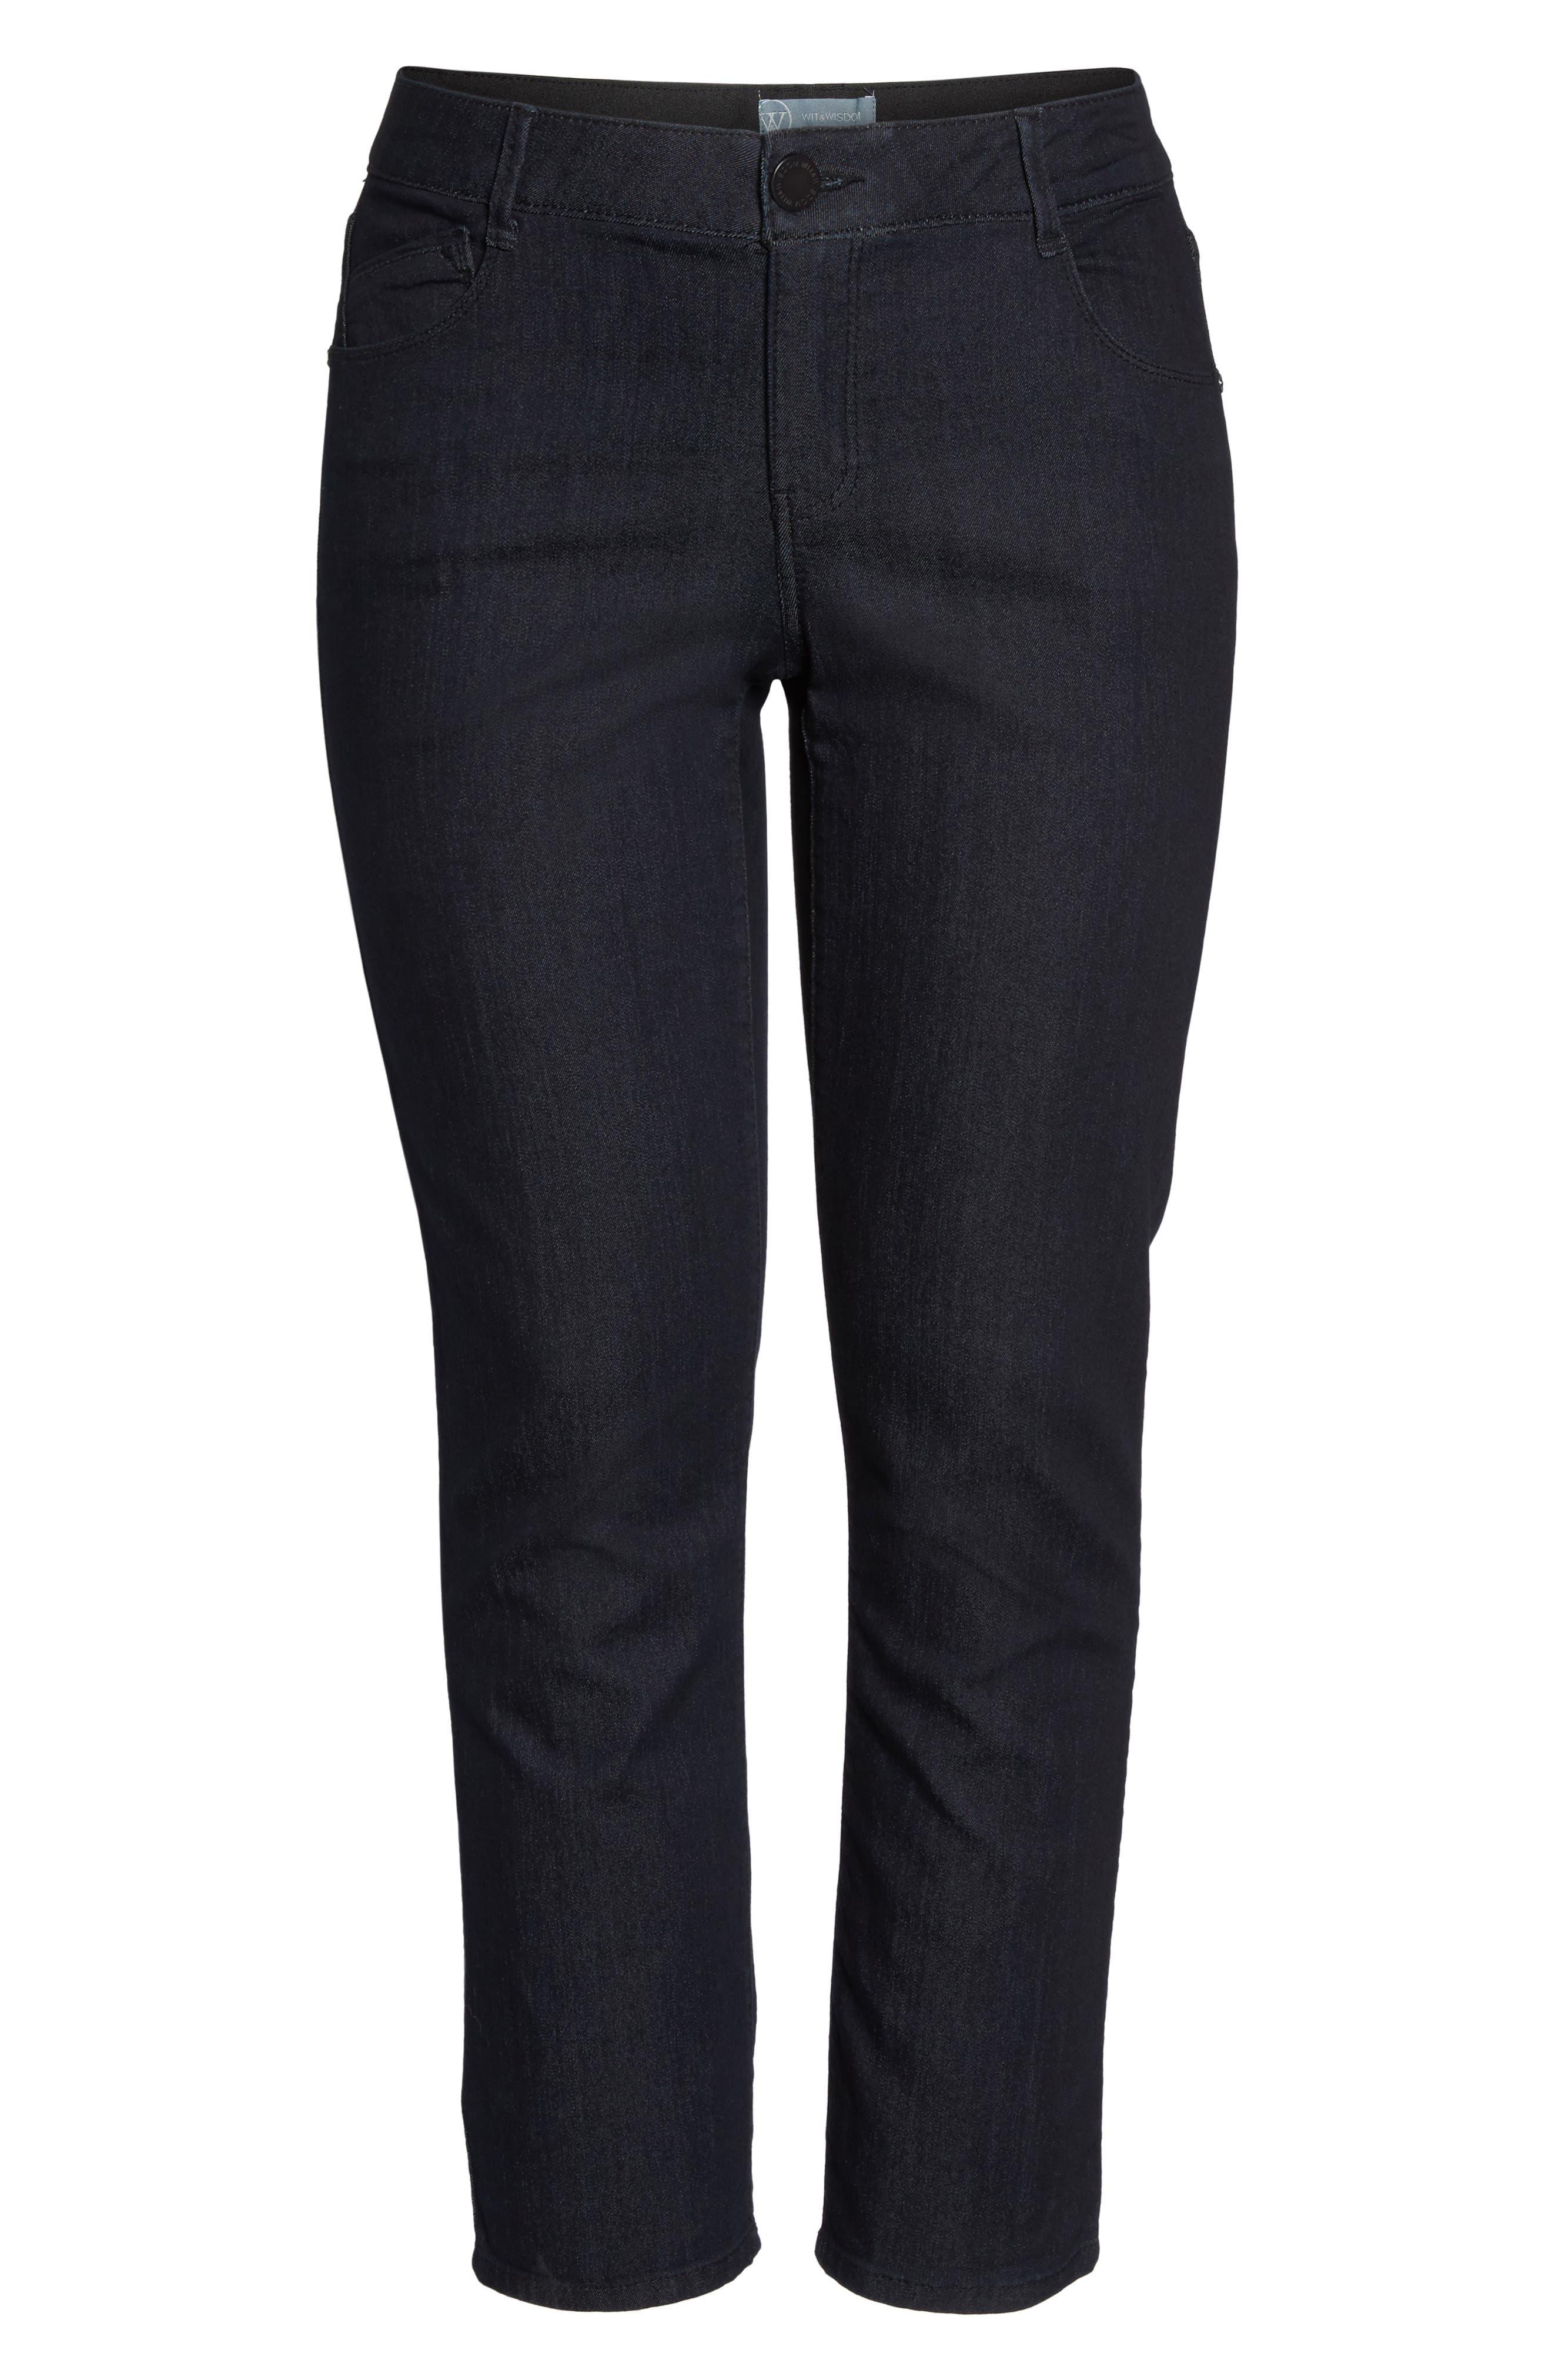 Ab-solution Straight Leg Jeans,                             Alternate thumbnail 7, color,                             INDIGO